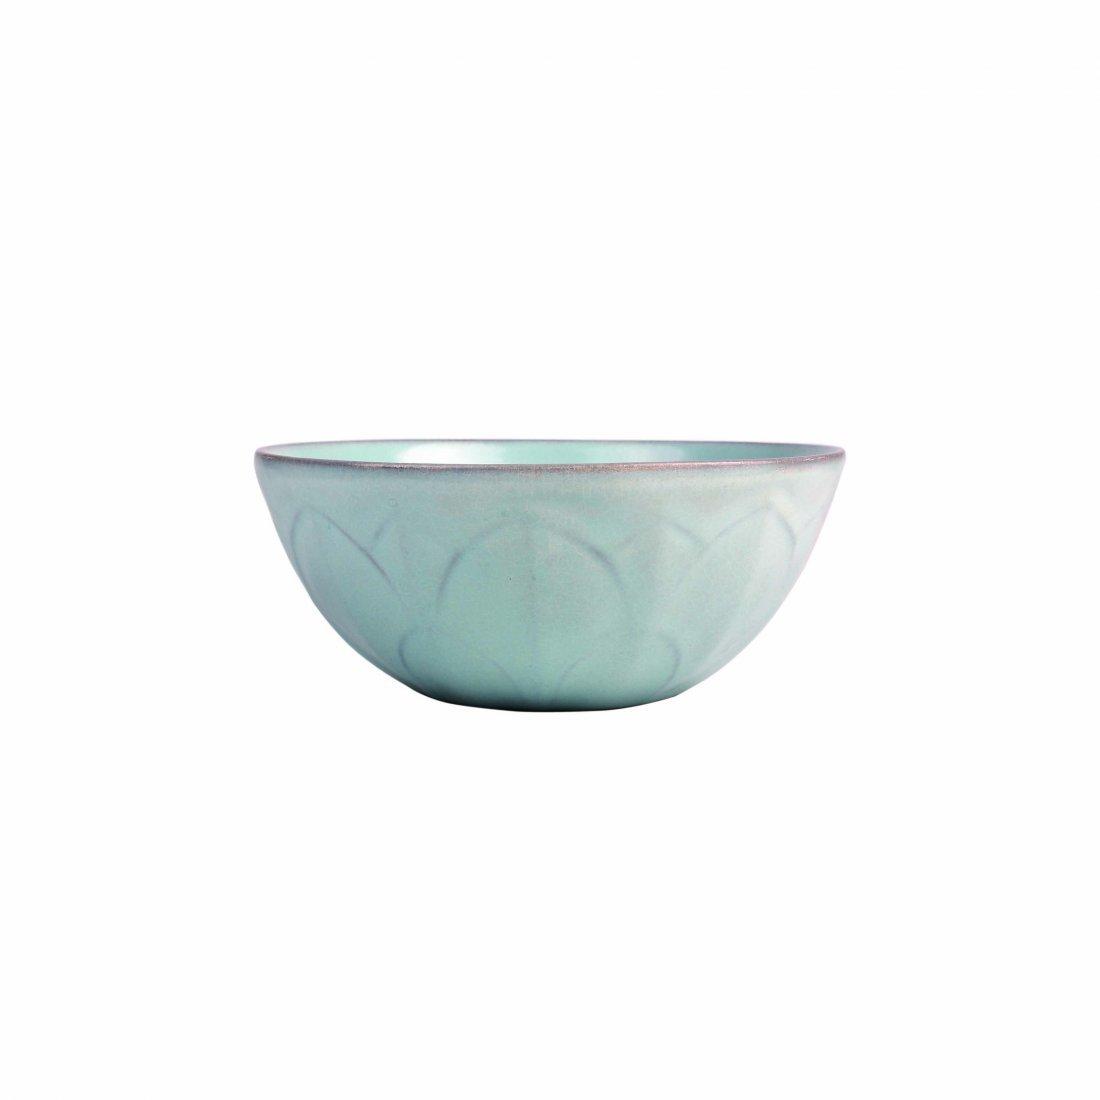 A 'Ru' ware Celadon 'Lotus' Bowl